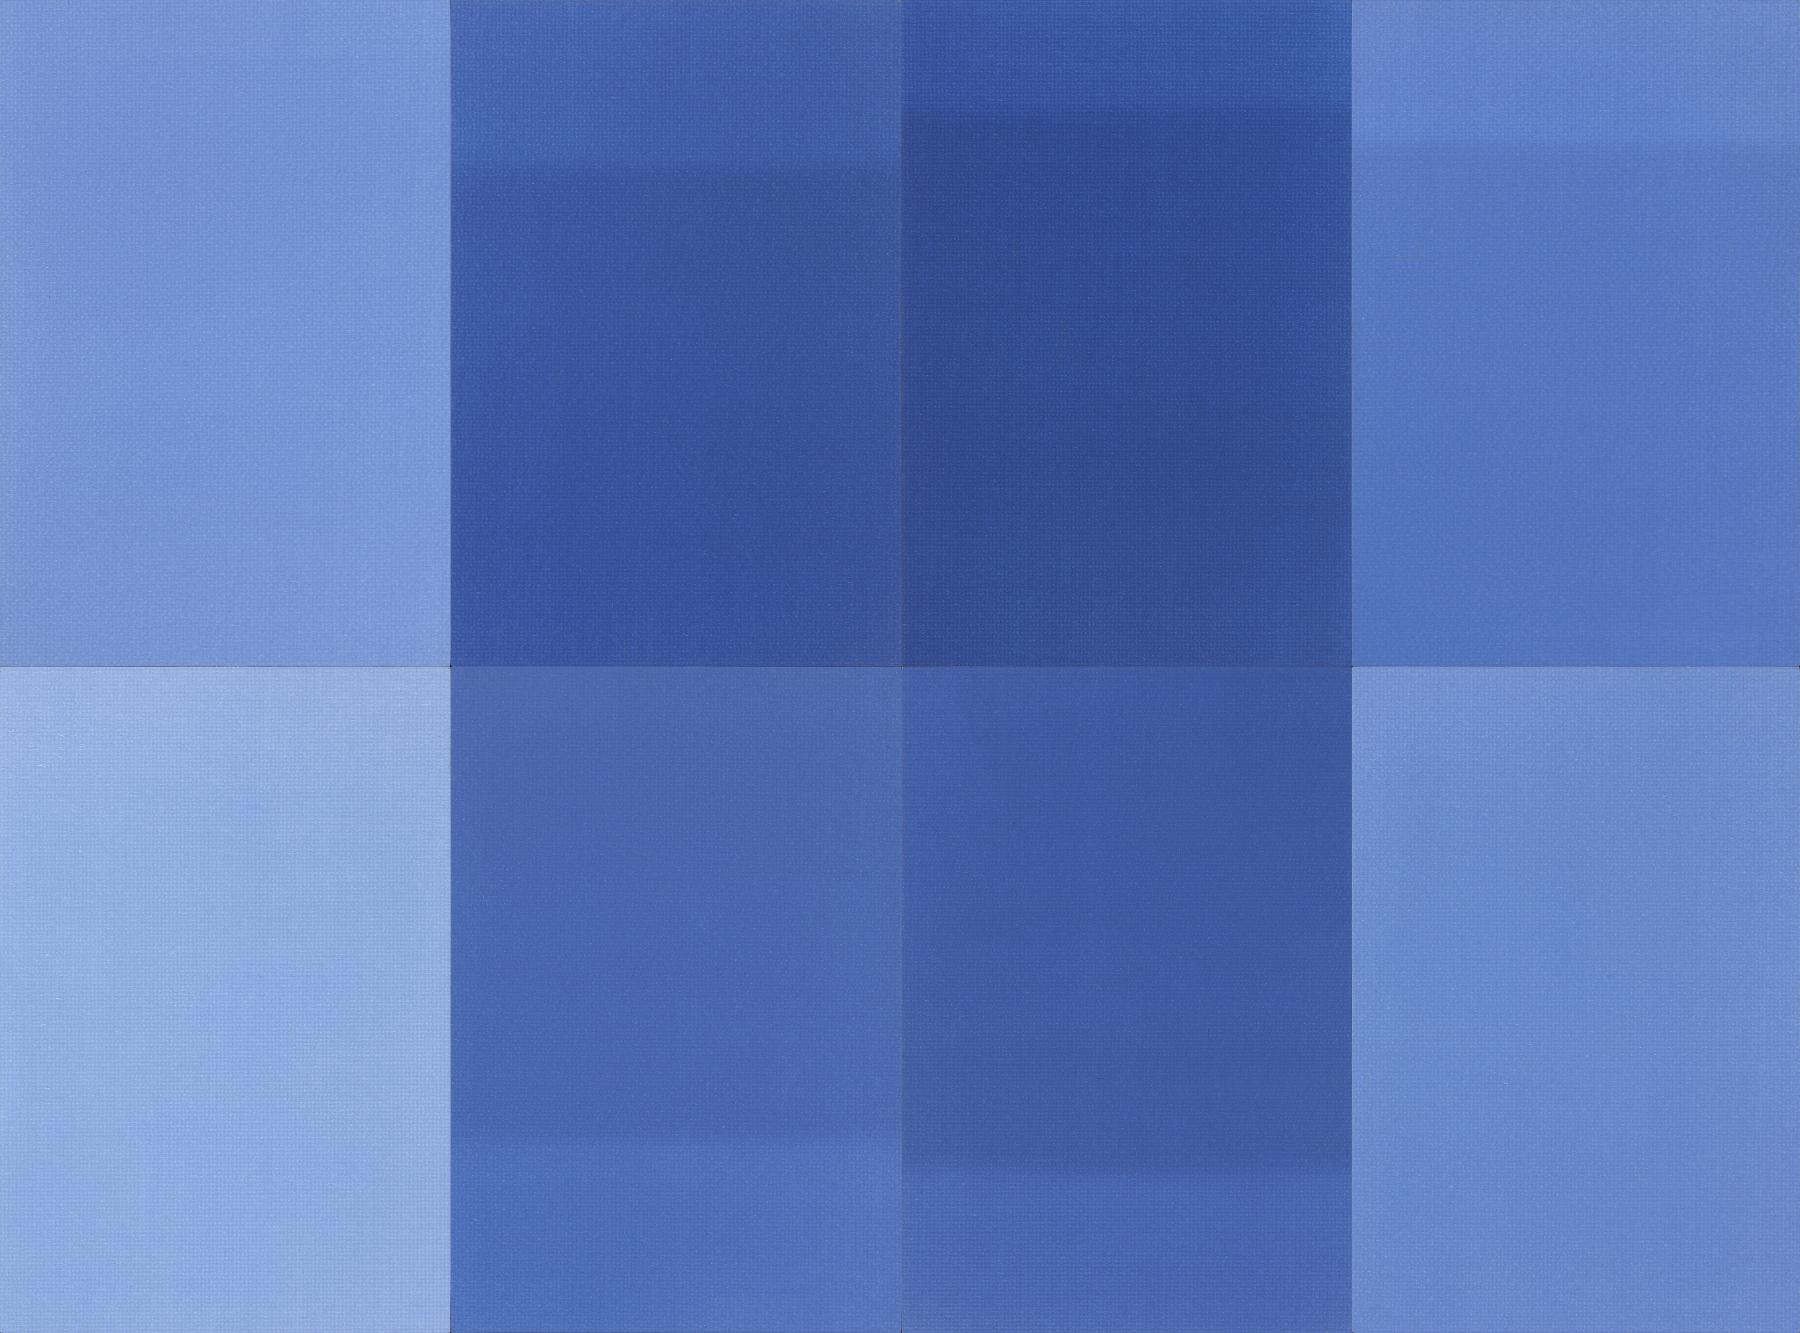 """Tessitura n. 01/02/03/04/05/06/07/08"", 2018, tecnica mista su tela, 240 x 320 cm, Courtesy l'artista"